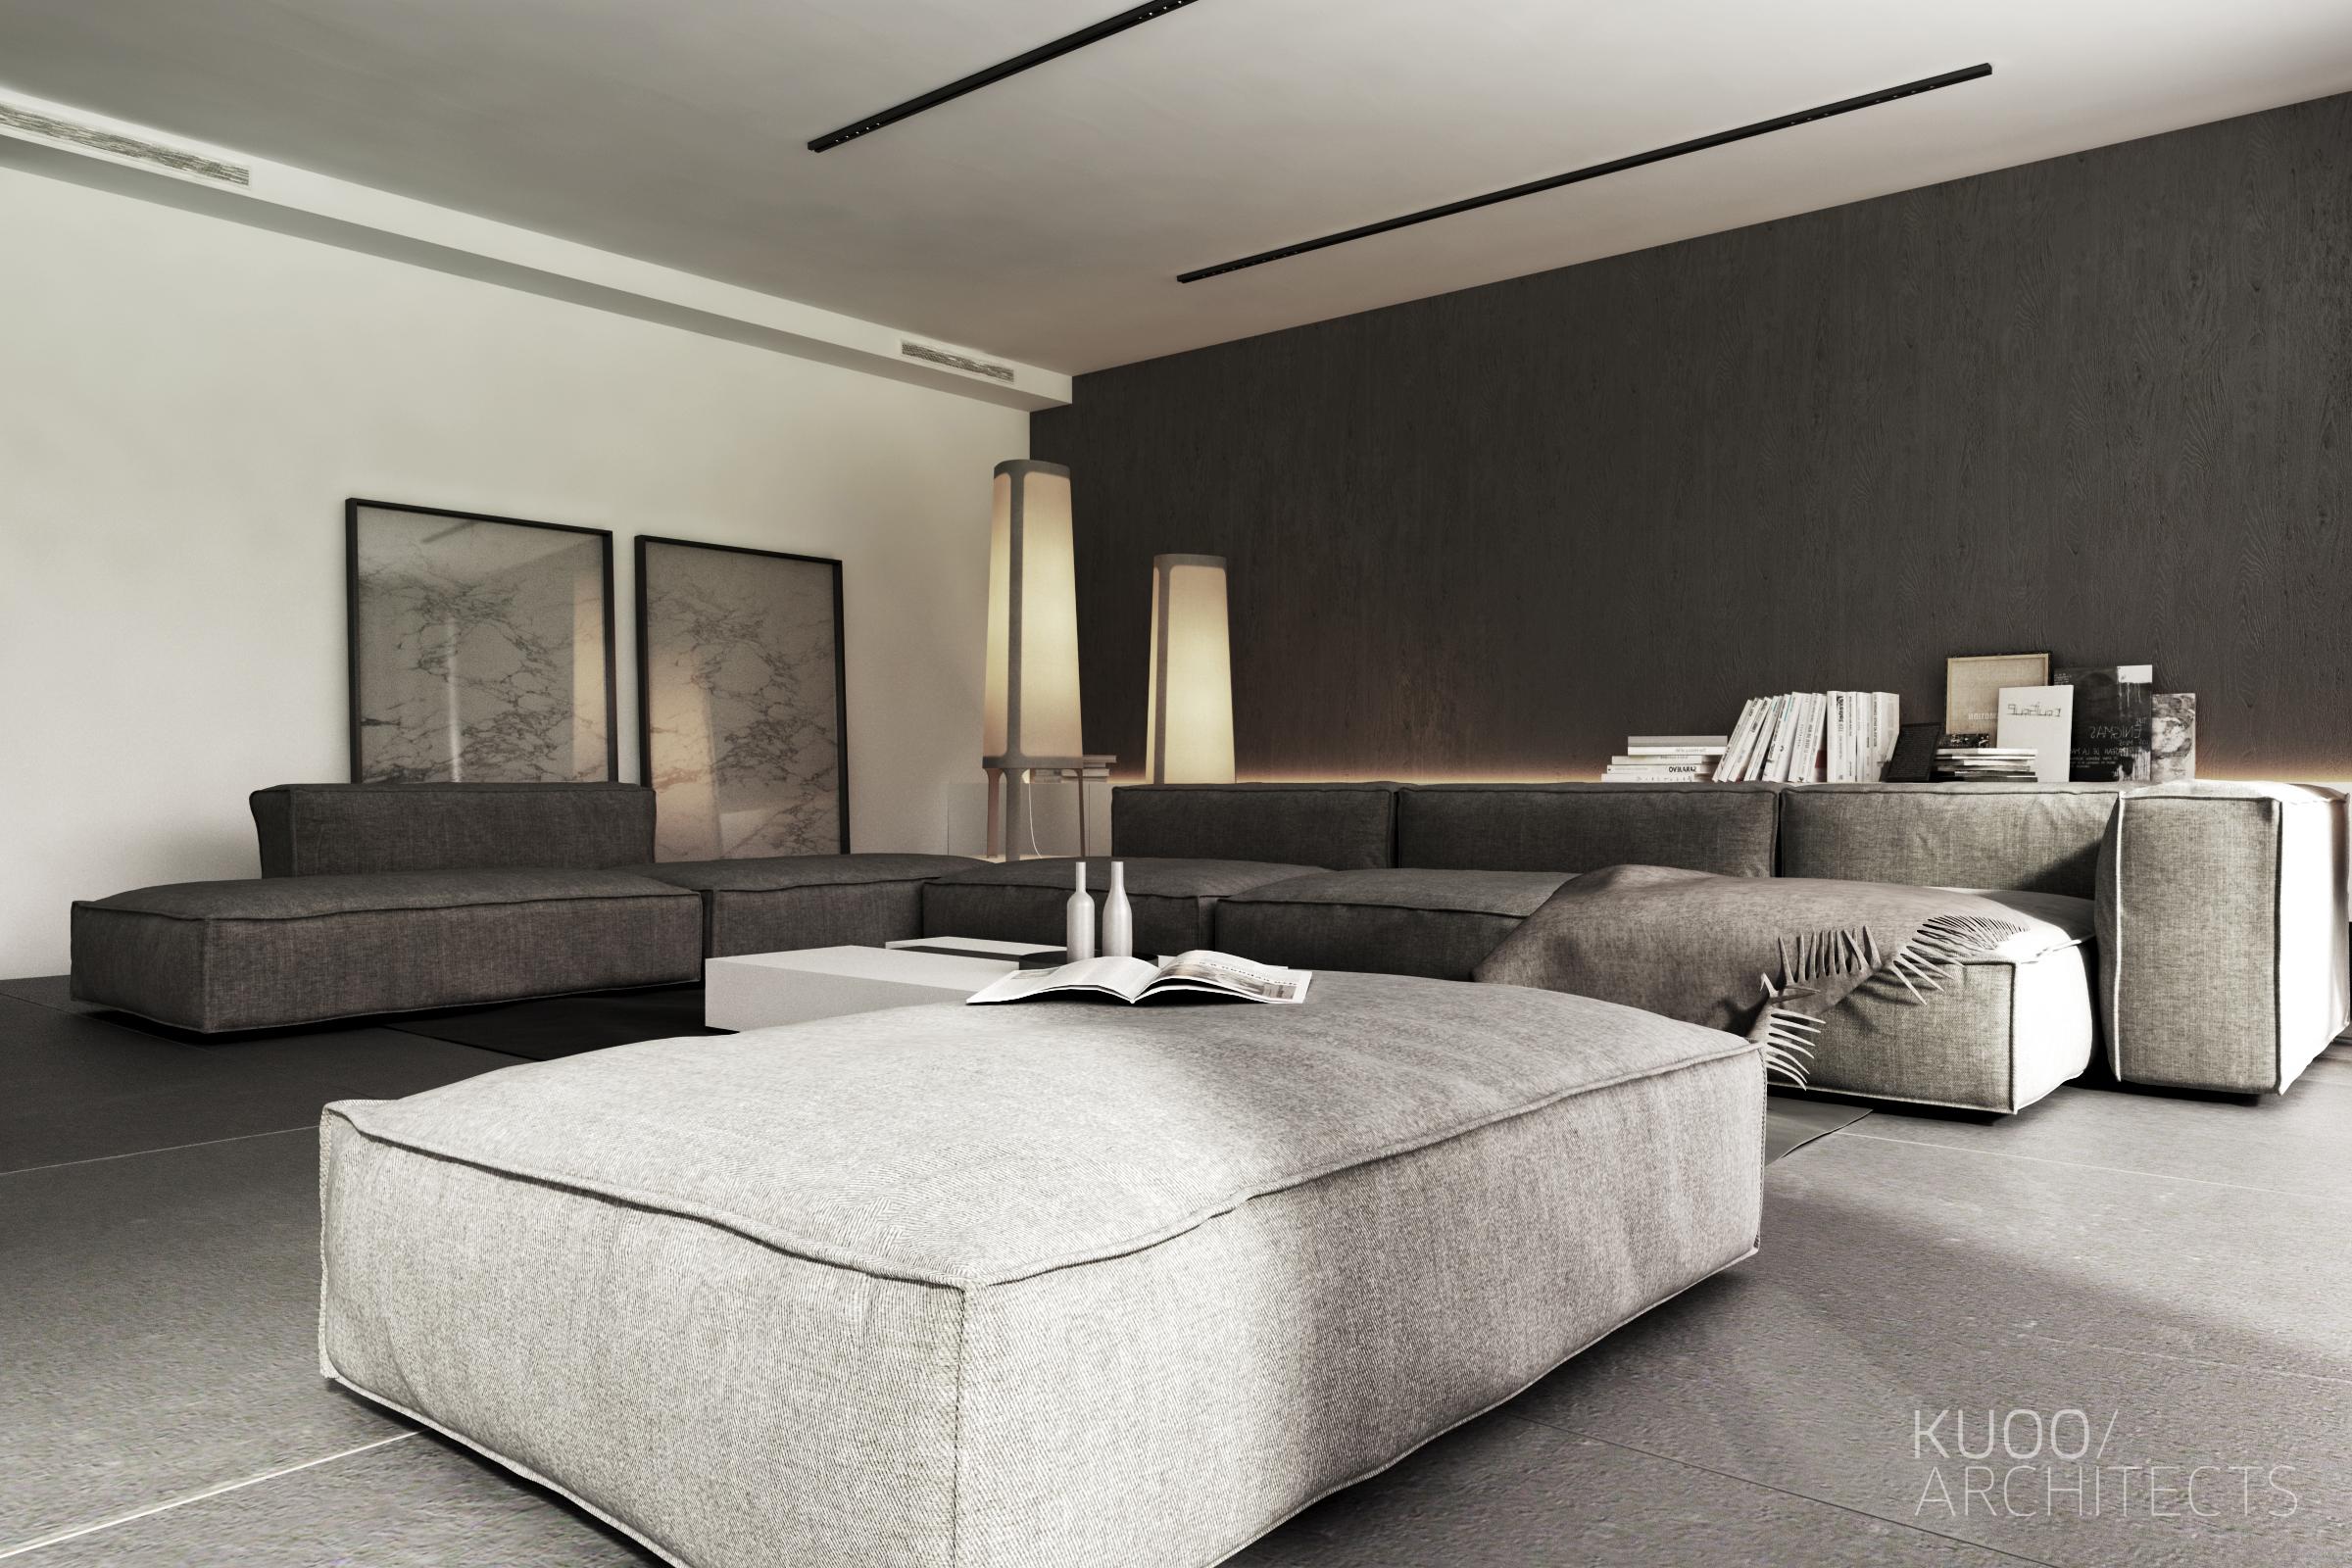 kuoo_architects_interior_design_minimal_contemporary (11) logo